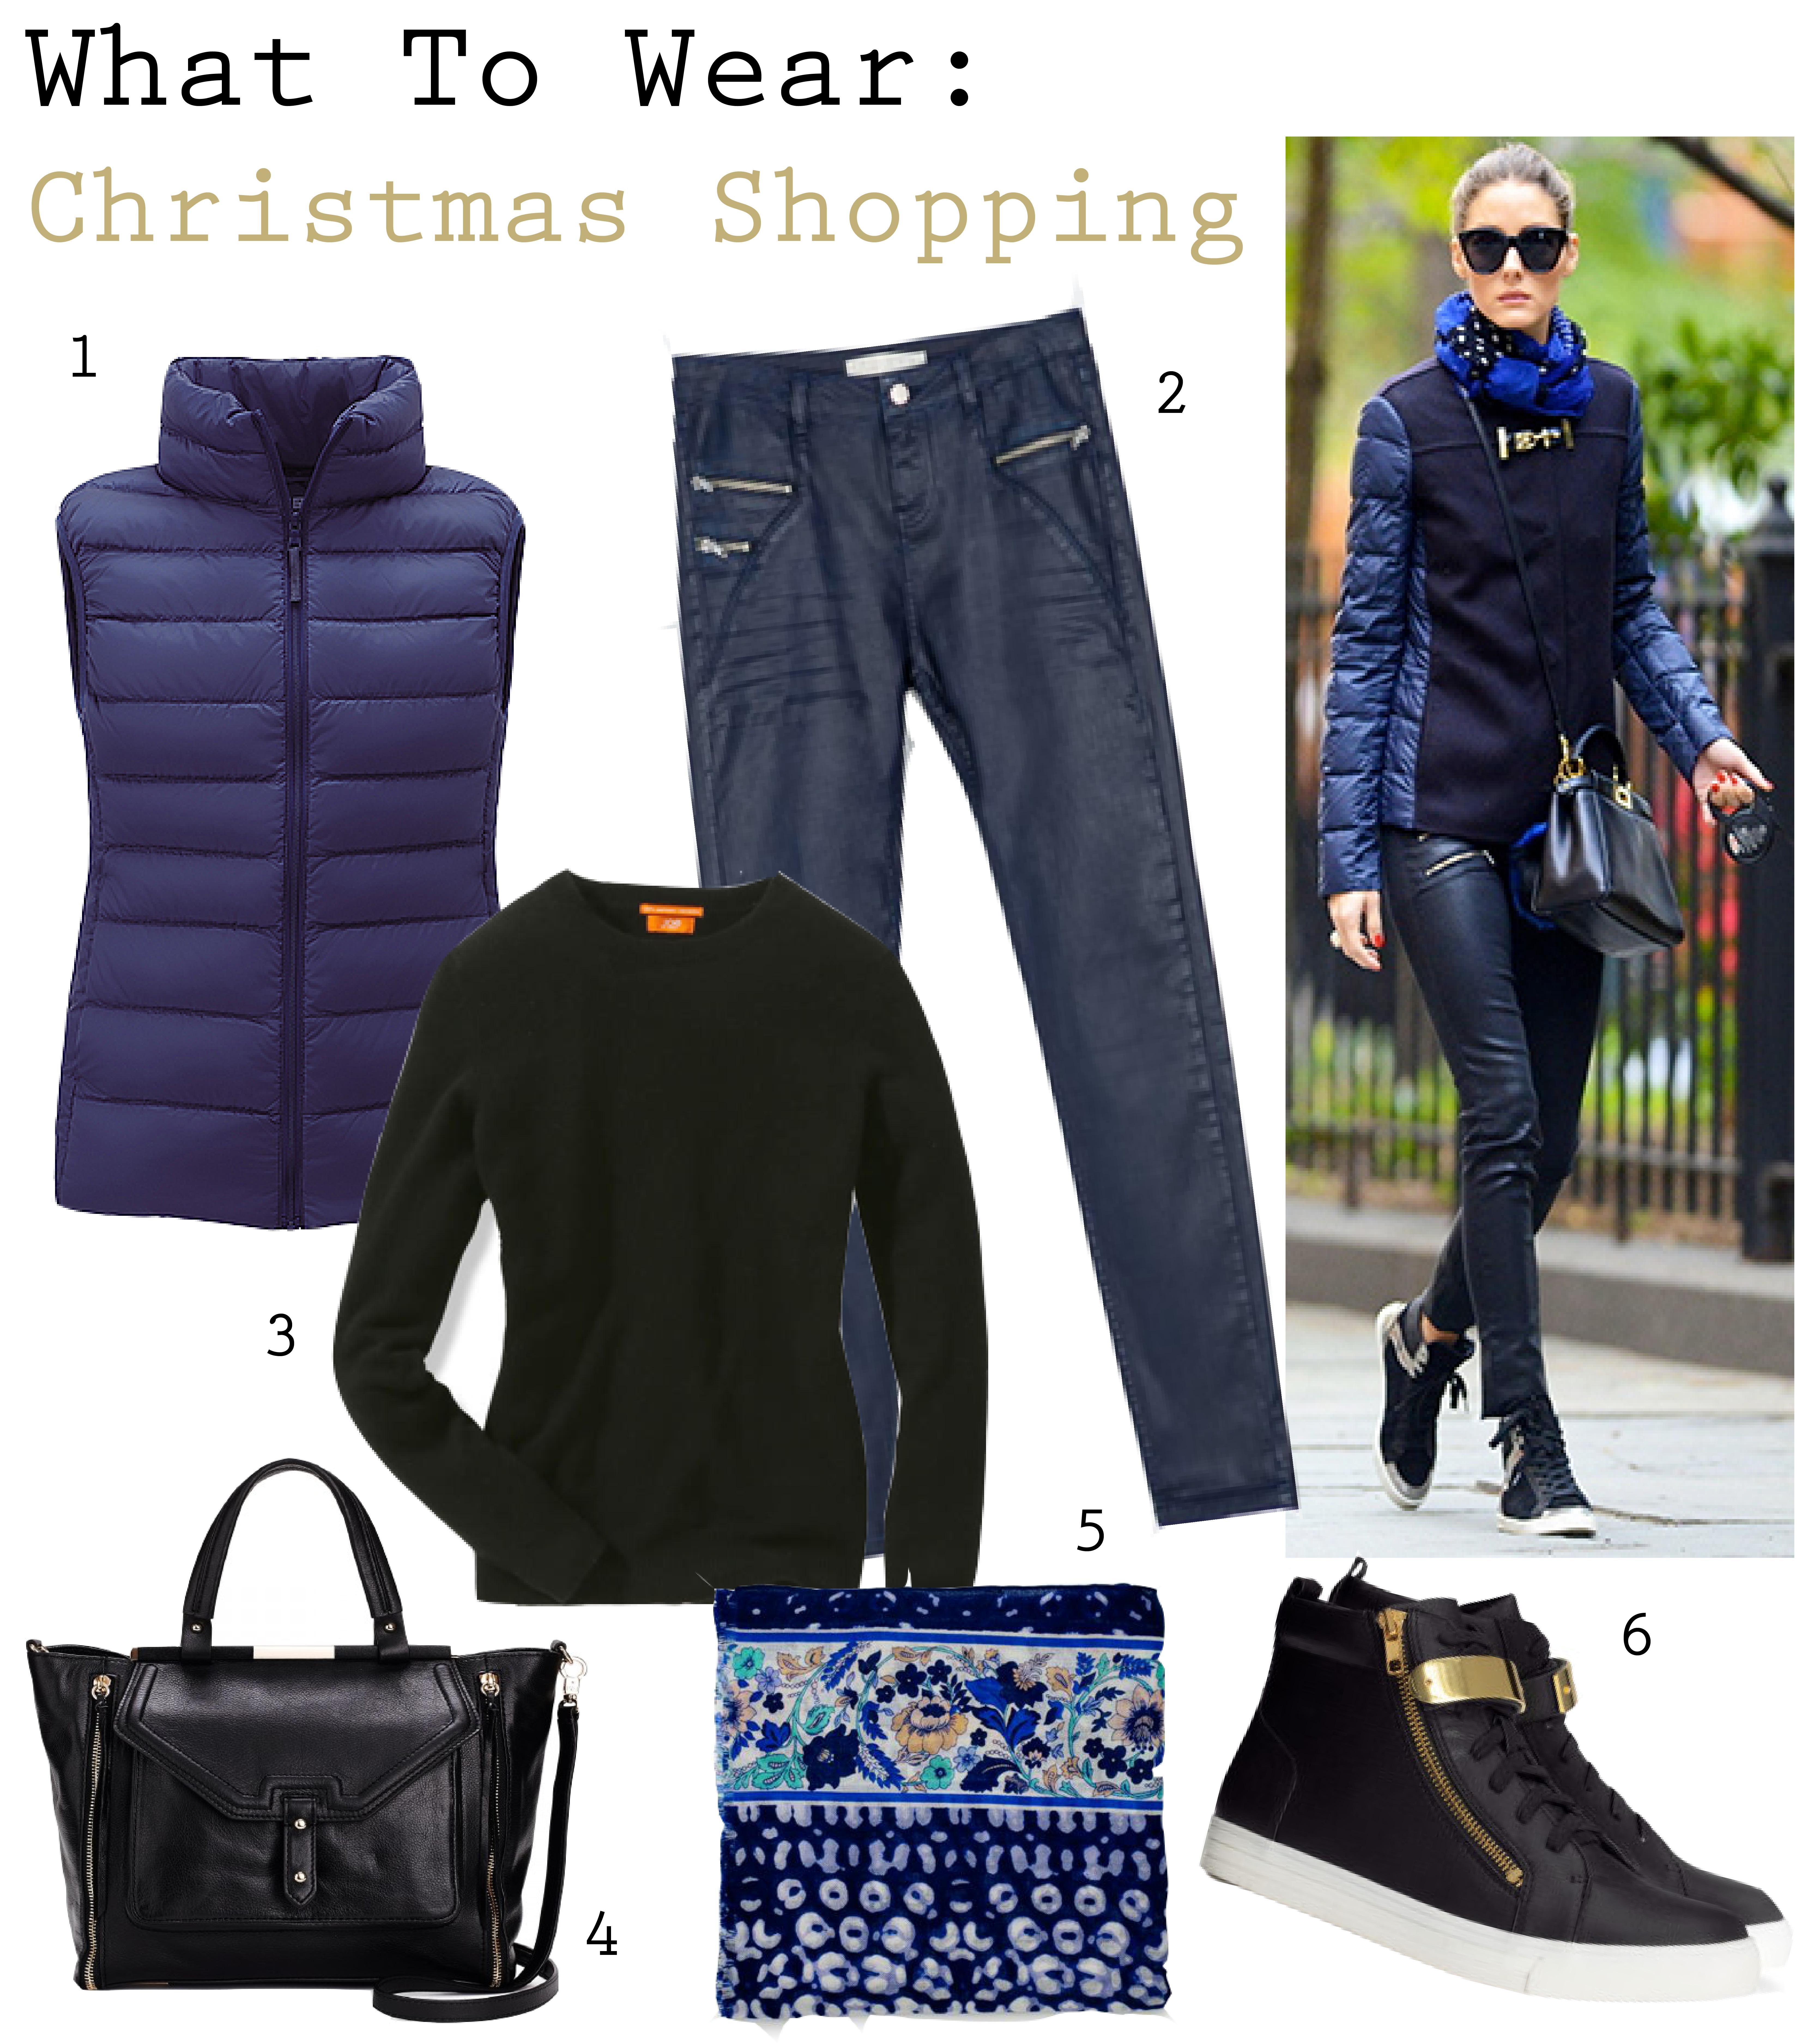 What To Wear: Christmas Shopping | FAT FREE FASHION